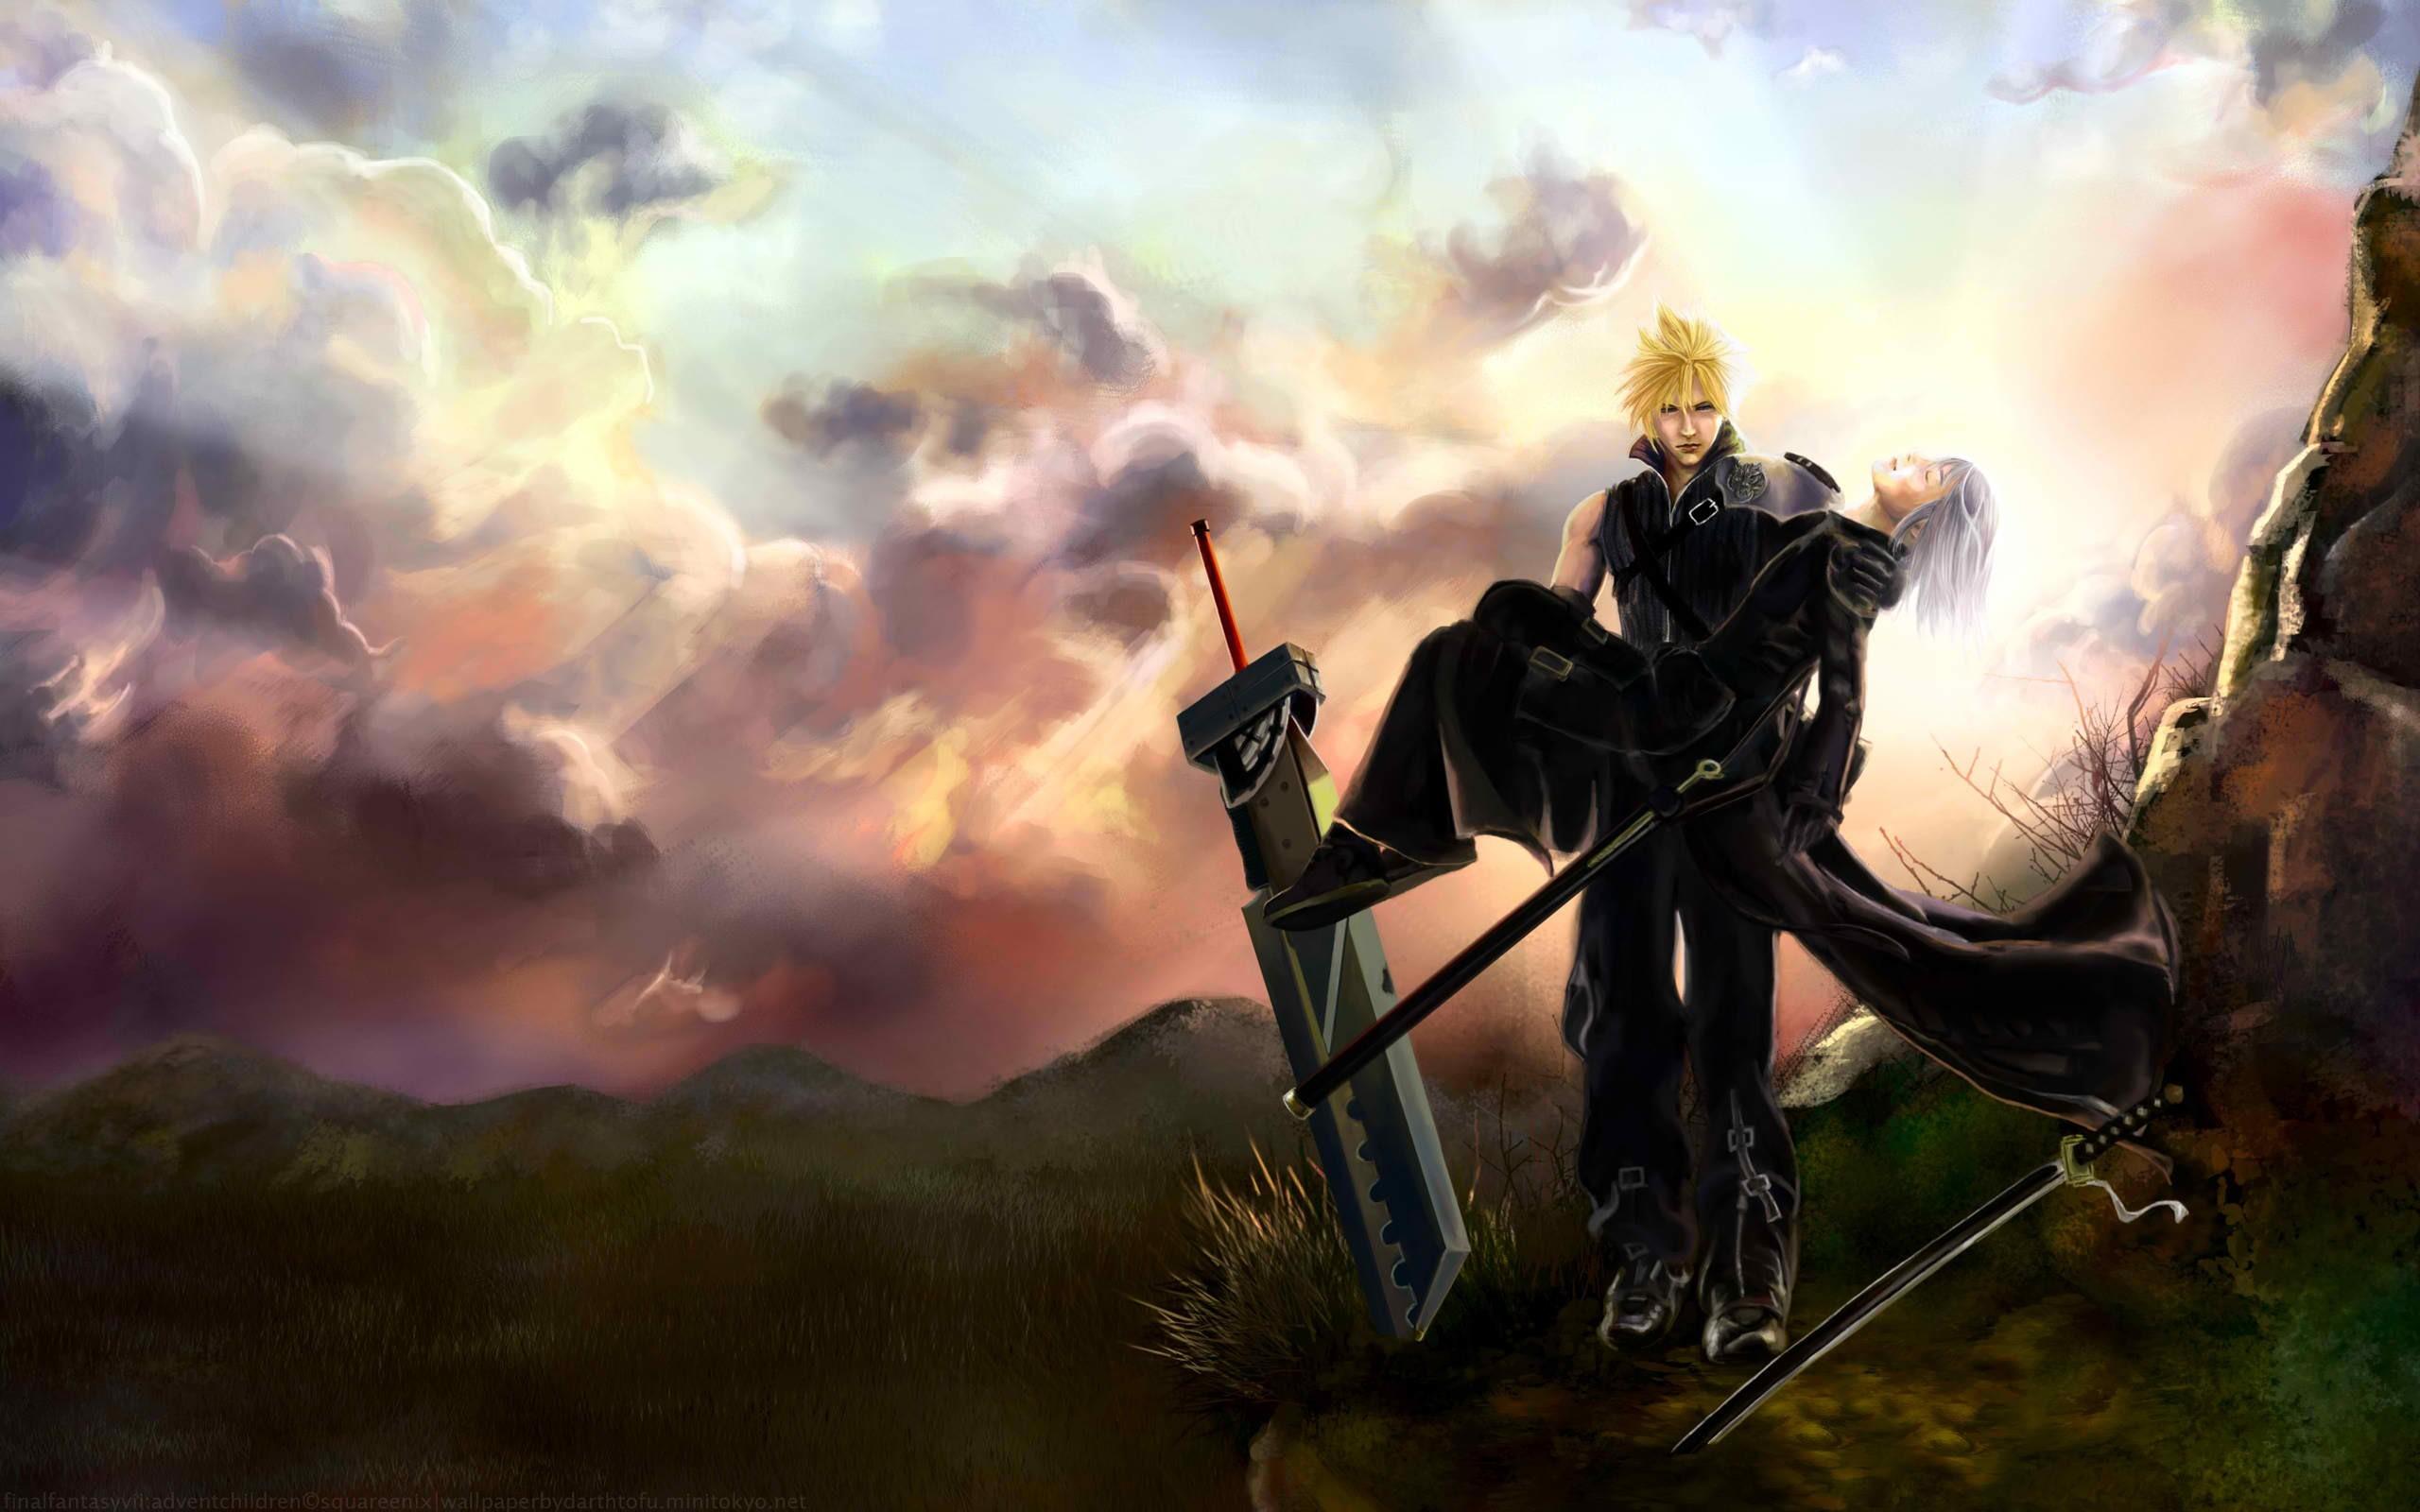 Final Fantasy Cloud Strife Wallpaper Wallpapertag